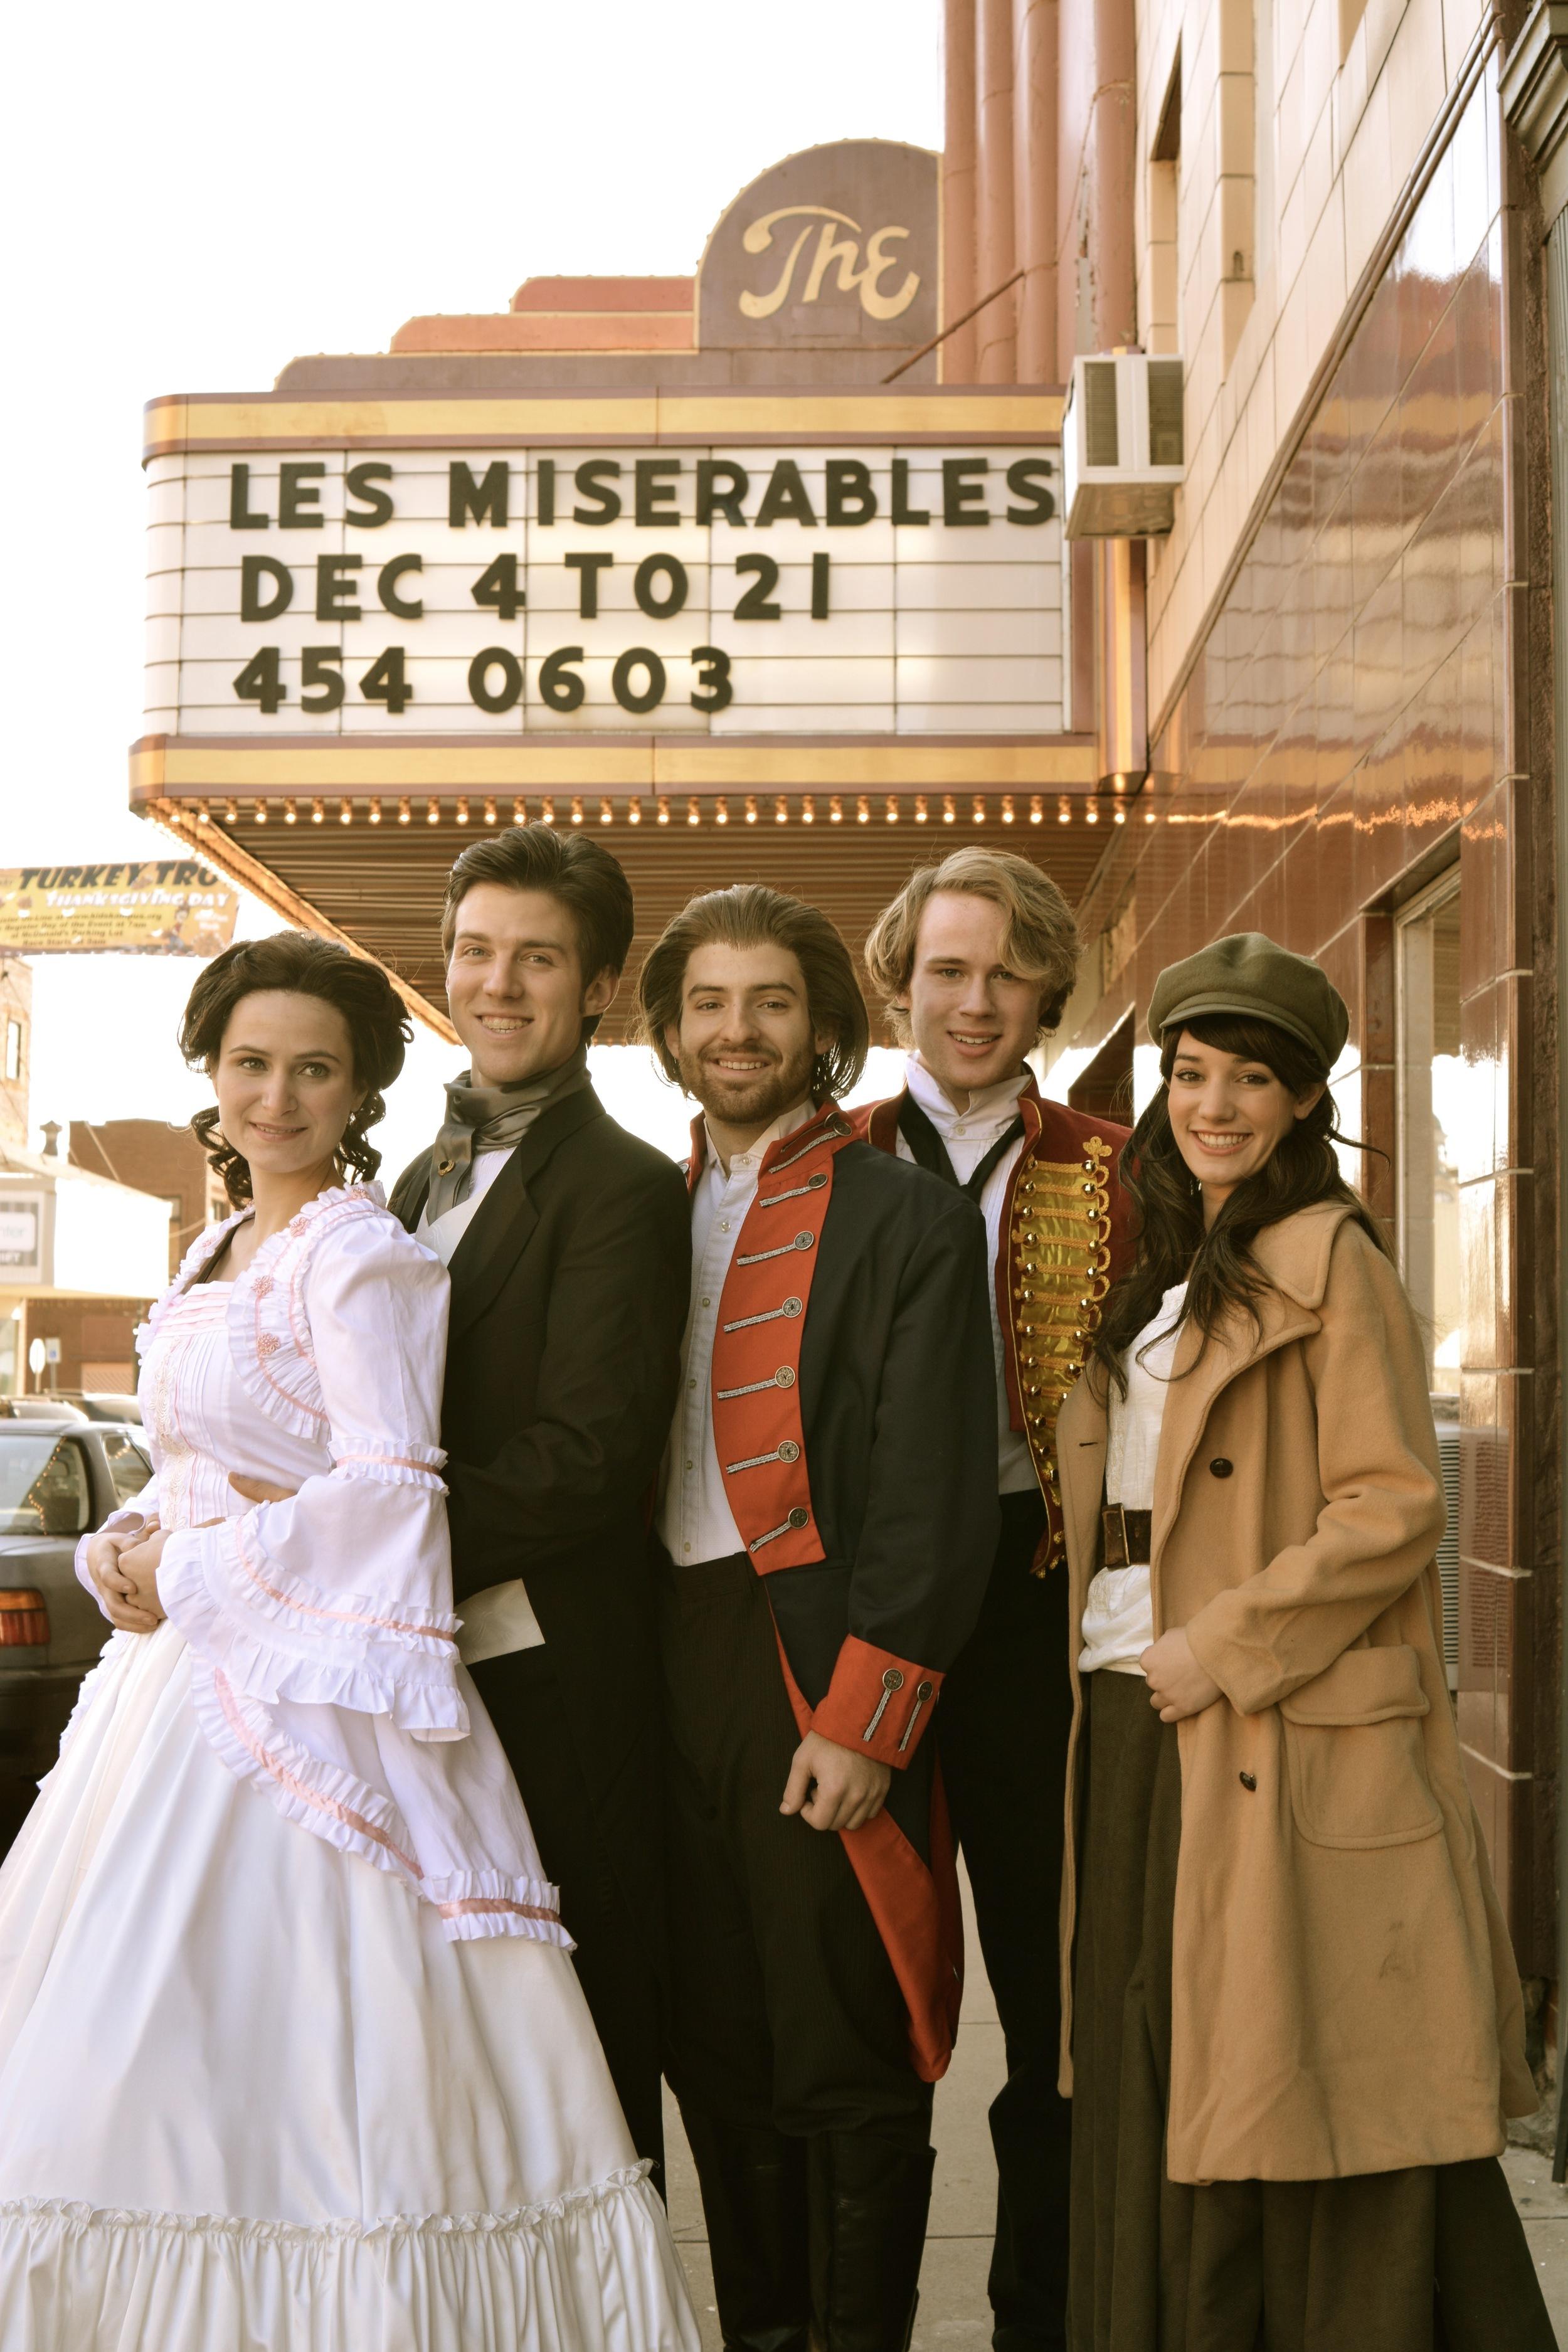 Left to Right - Rebecca Rosky as Cosette, Ethan Carpenter as Marius, Landon Sholar as Jean Valjean, Charlie Tingen as Enjolras, Brooke Quintana as Eponine.